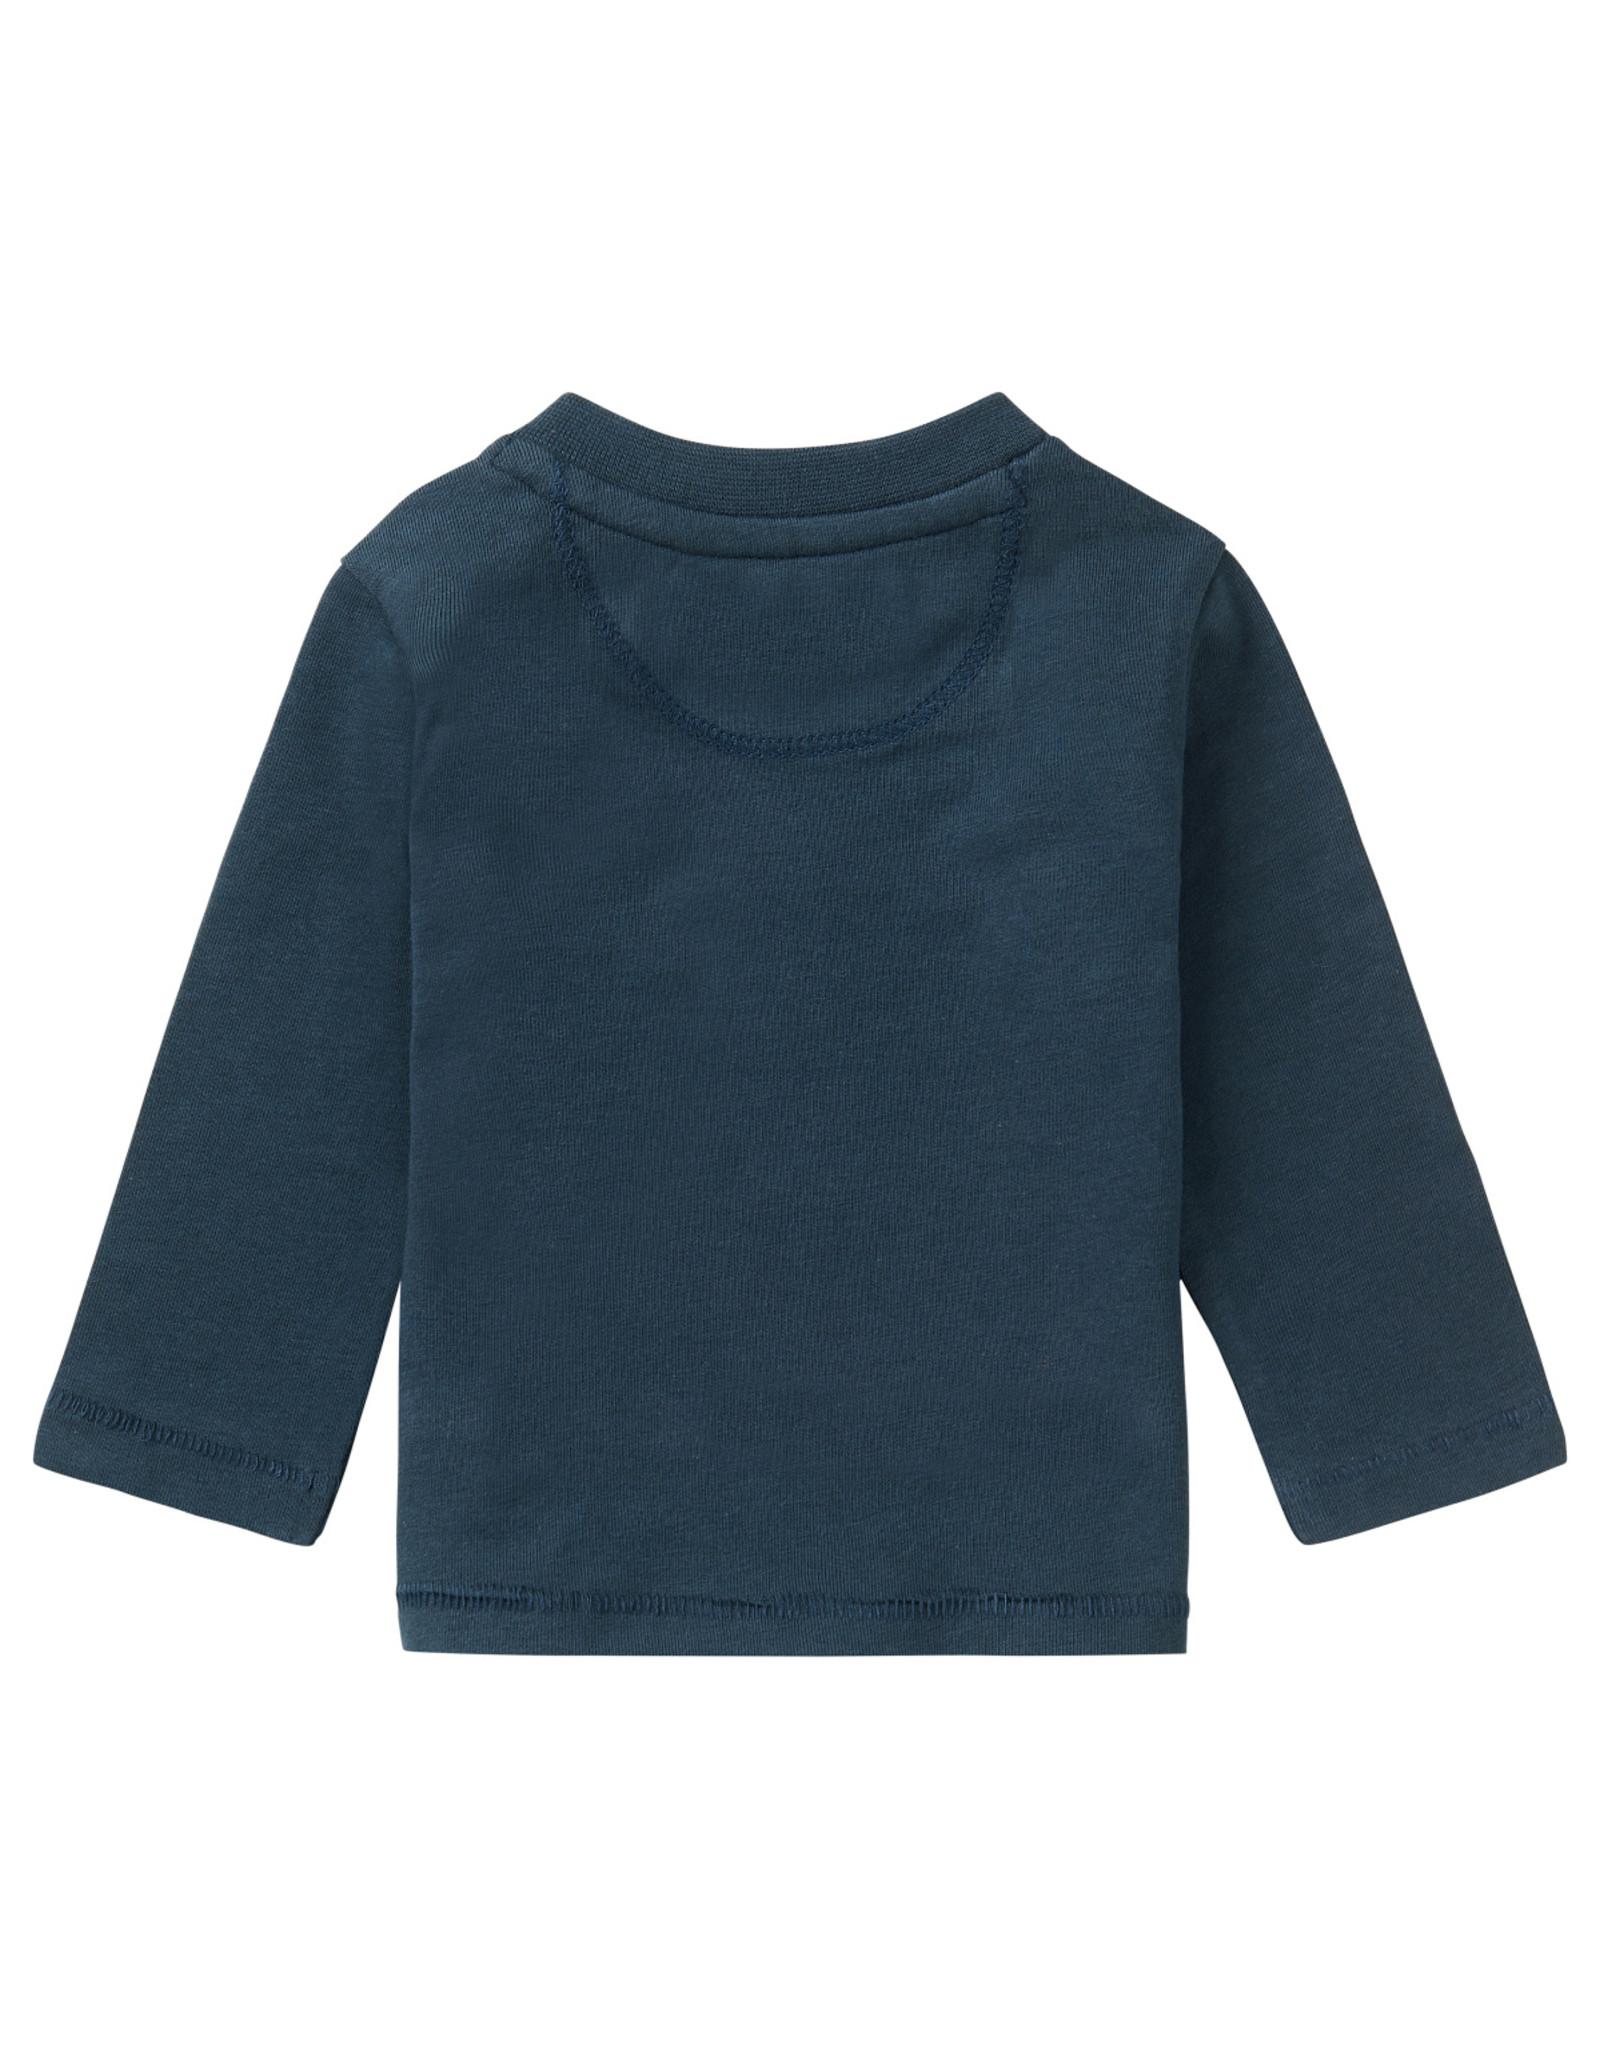 Noppies Noppies B T-shirt LS Cala Midnight Navy